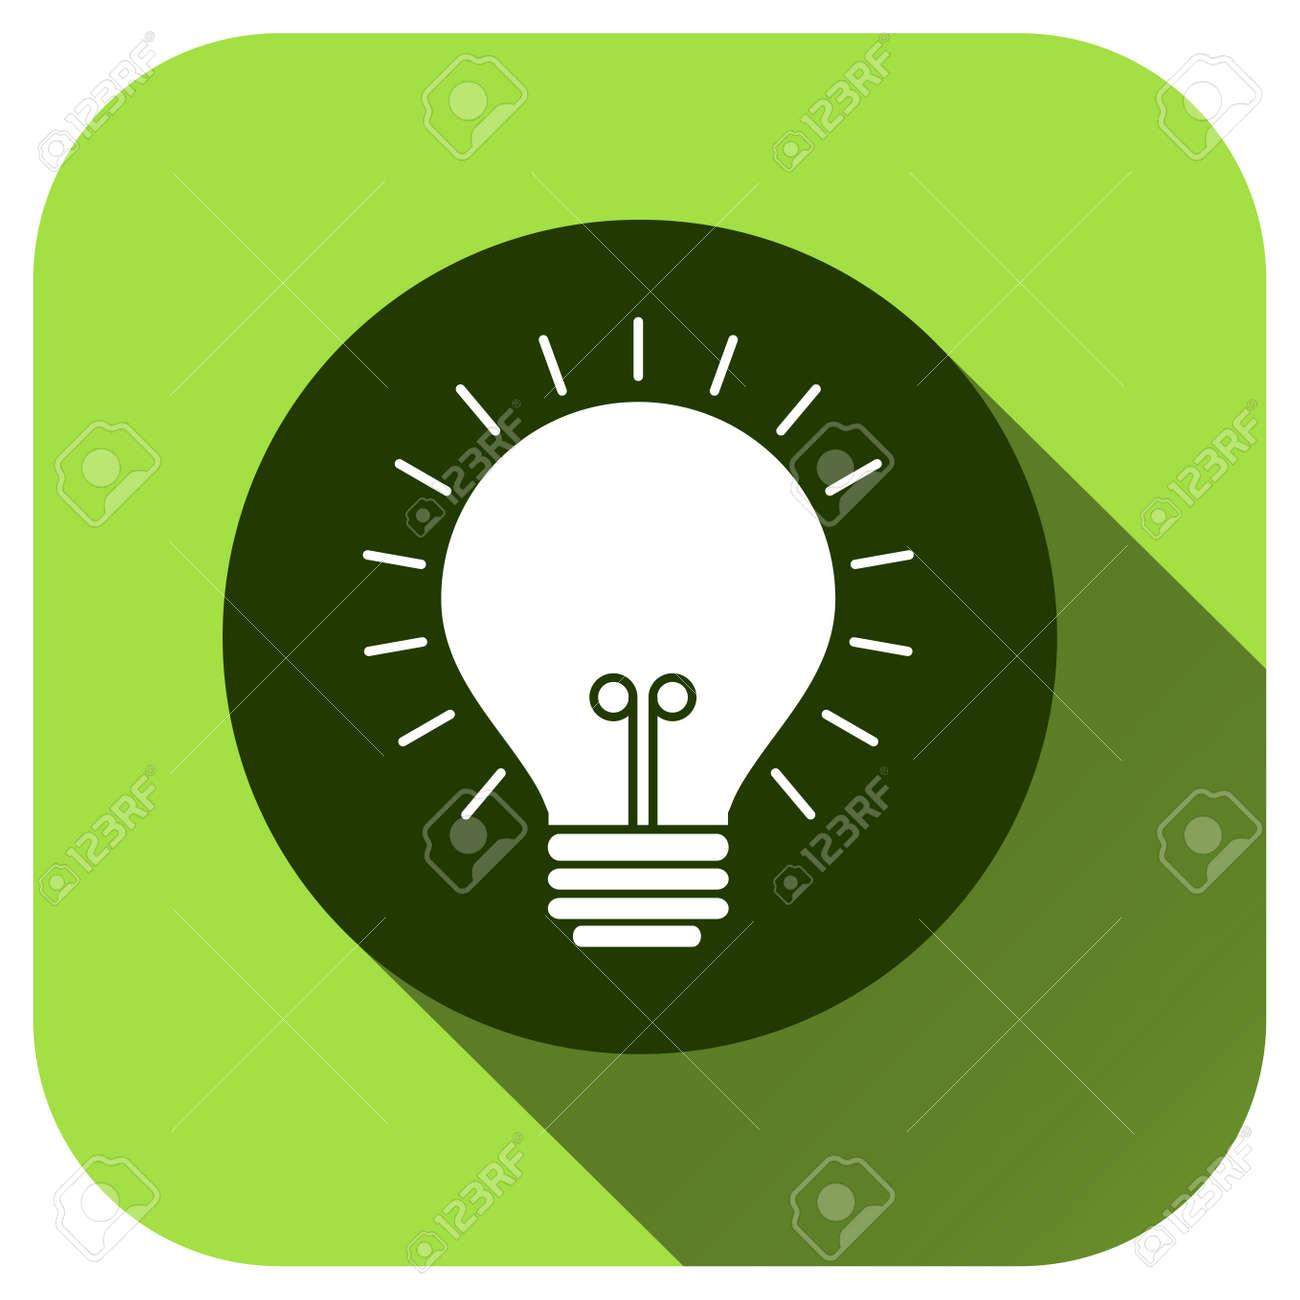 Lamp icon, vector logo for design, symbol, application, website, UI - 159607428